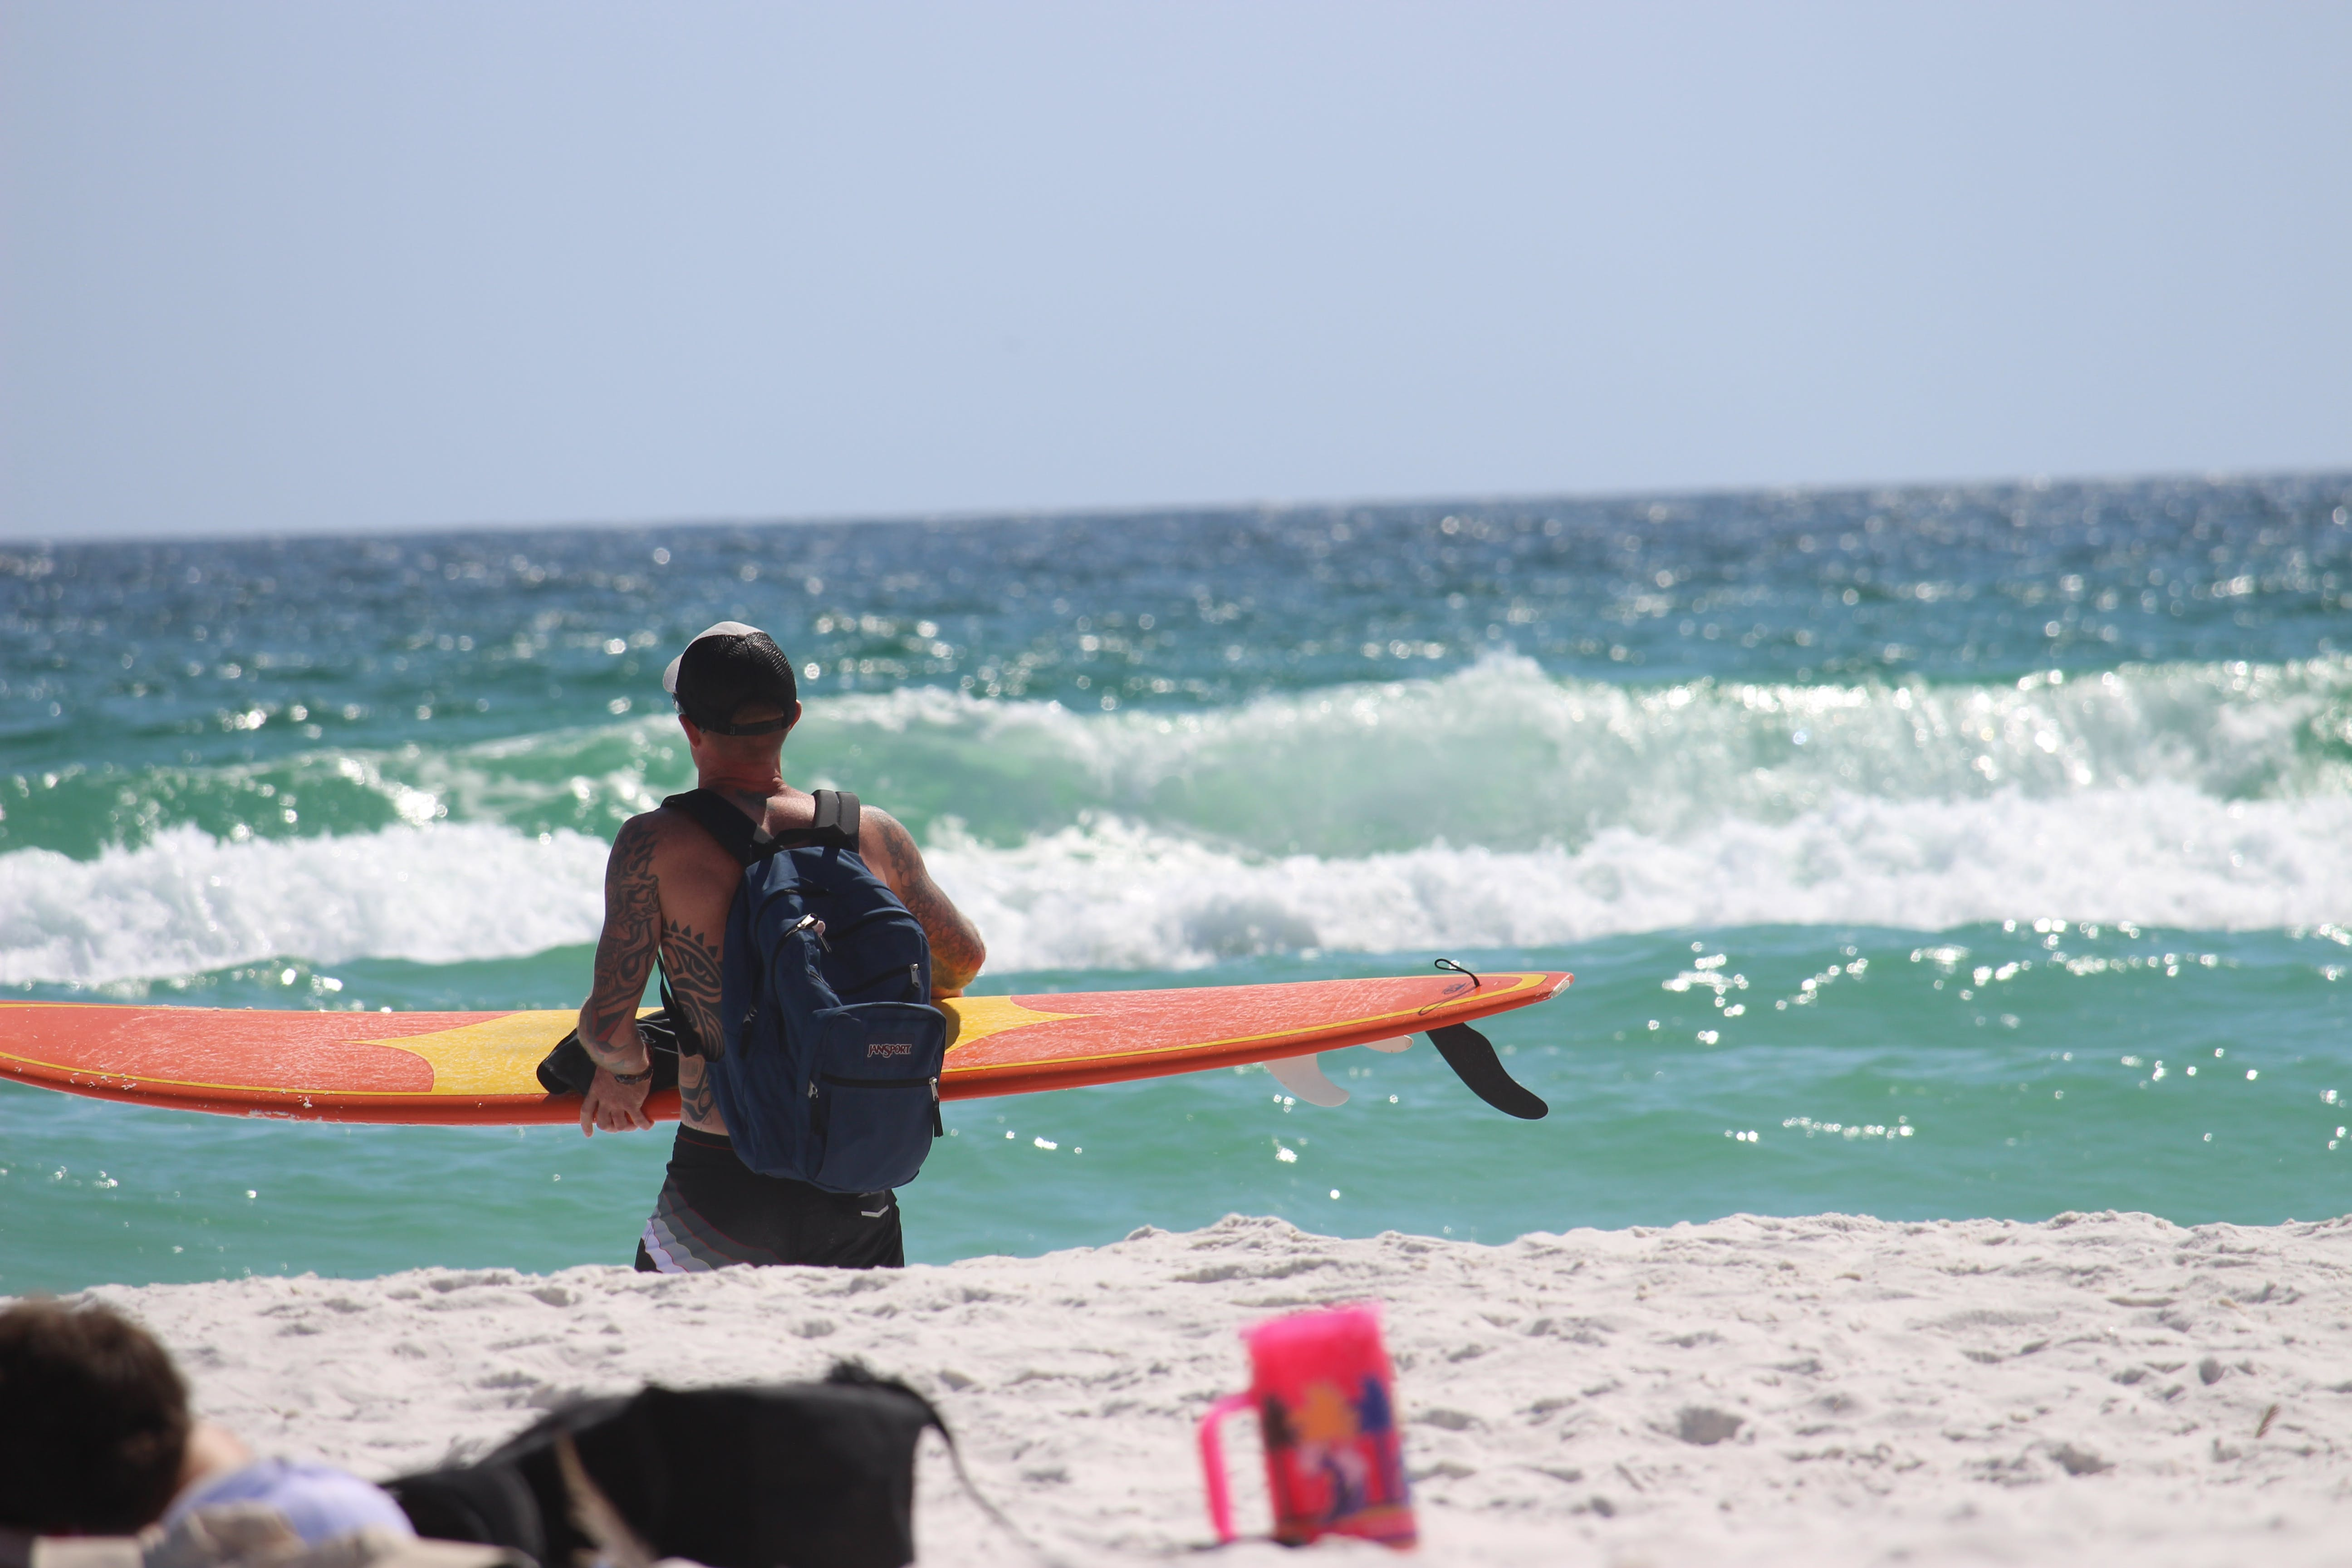 Man Carrying Orange Surfboard on Shore